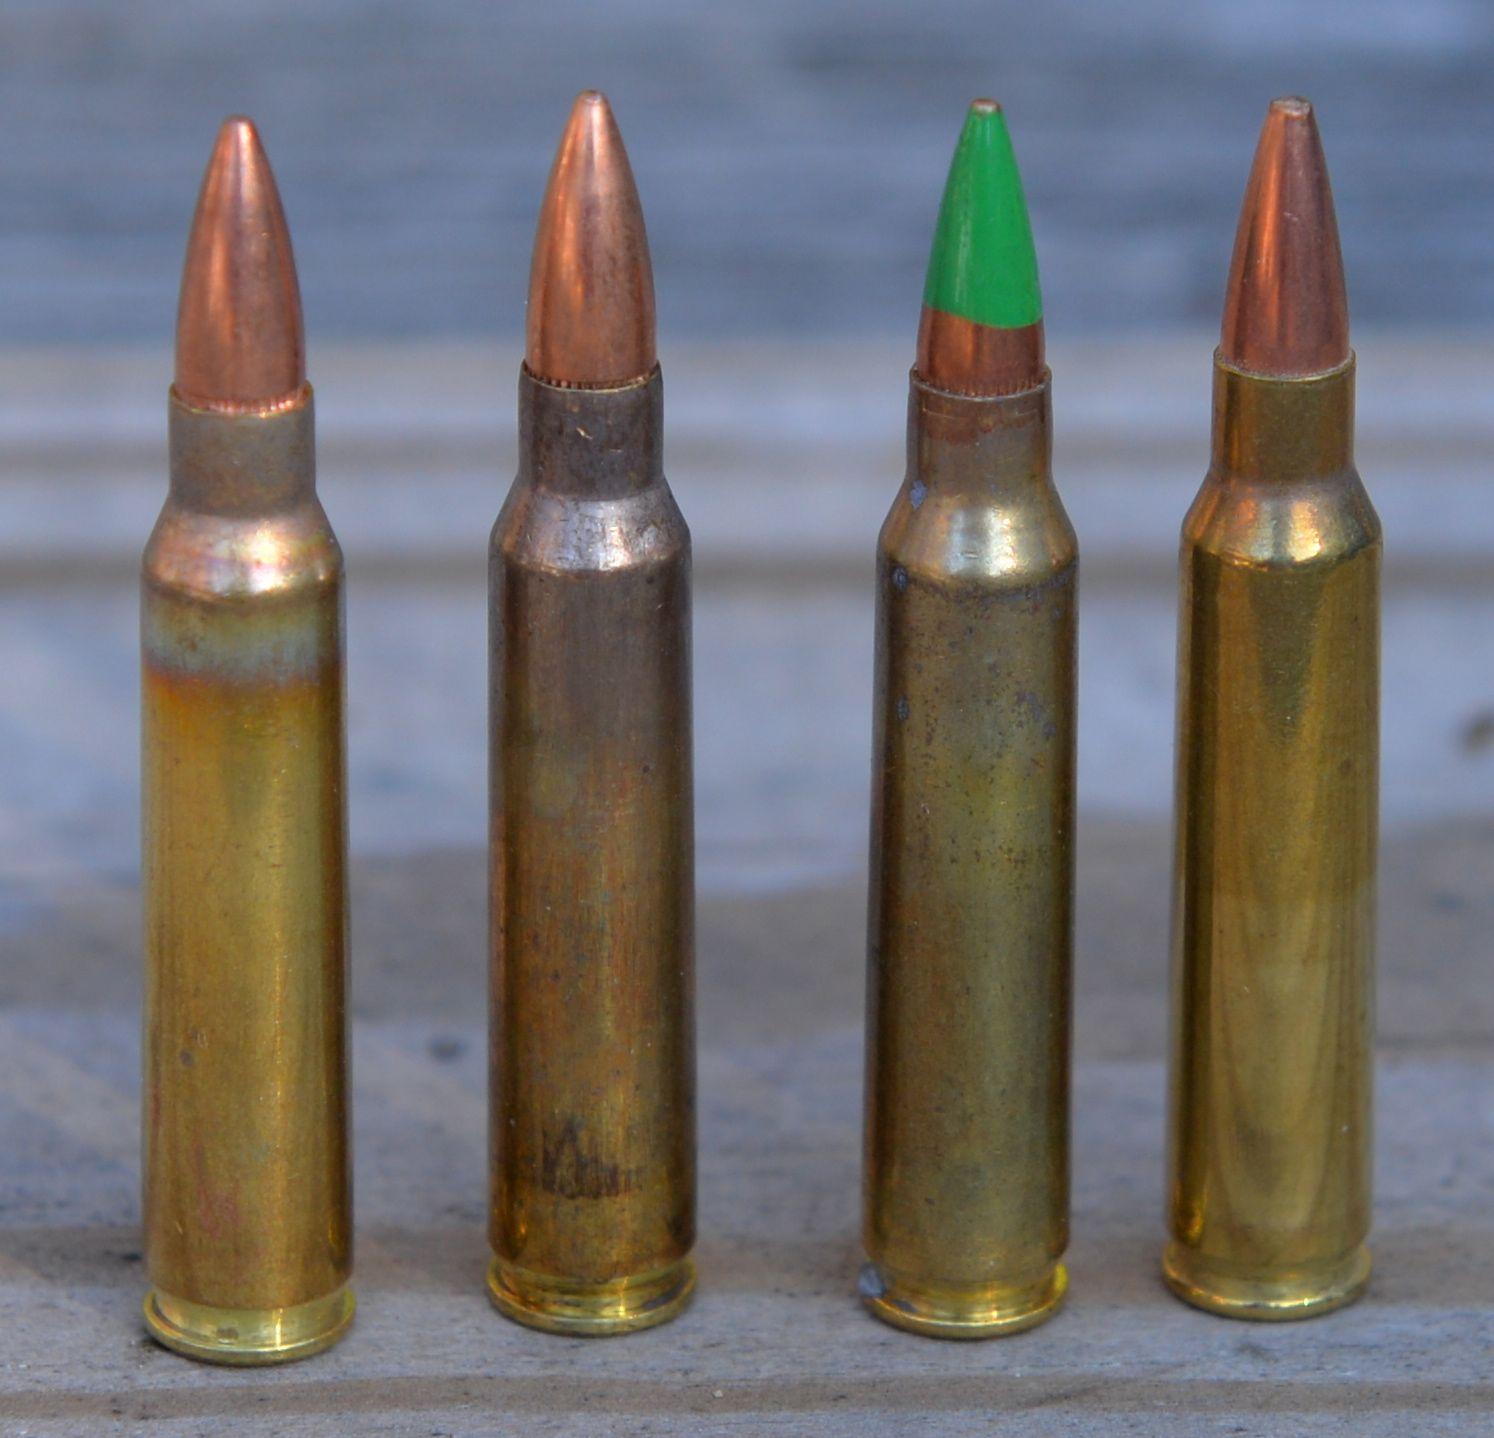 223 Ammuniton UMC 55 M193 M855 And Black Hills 68